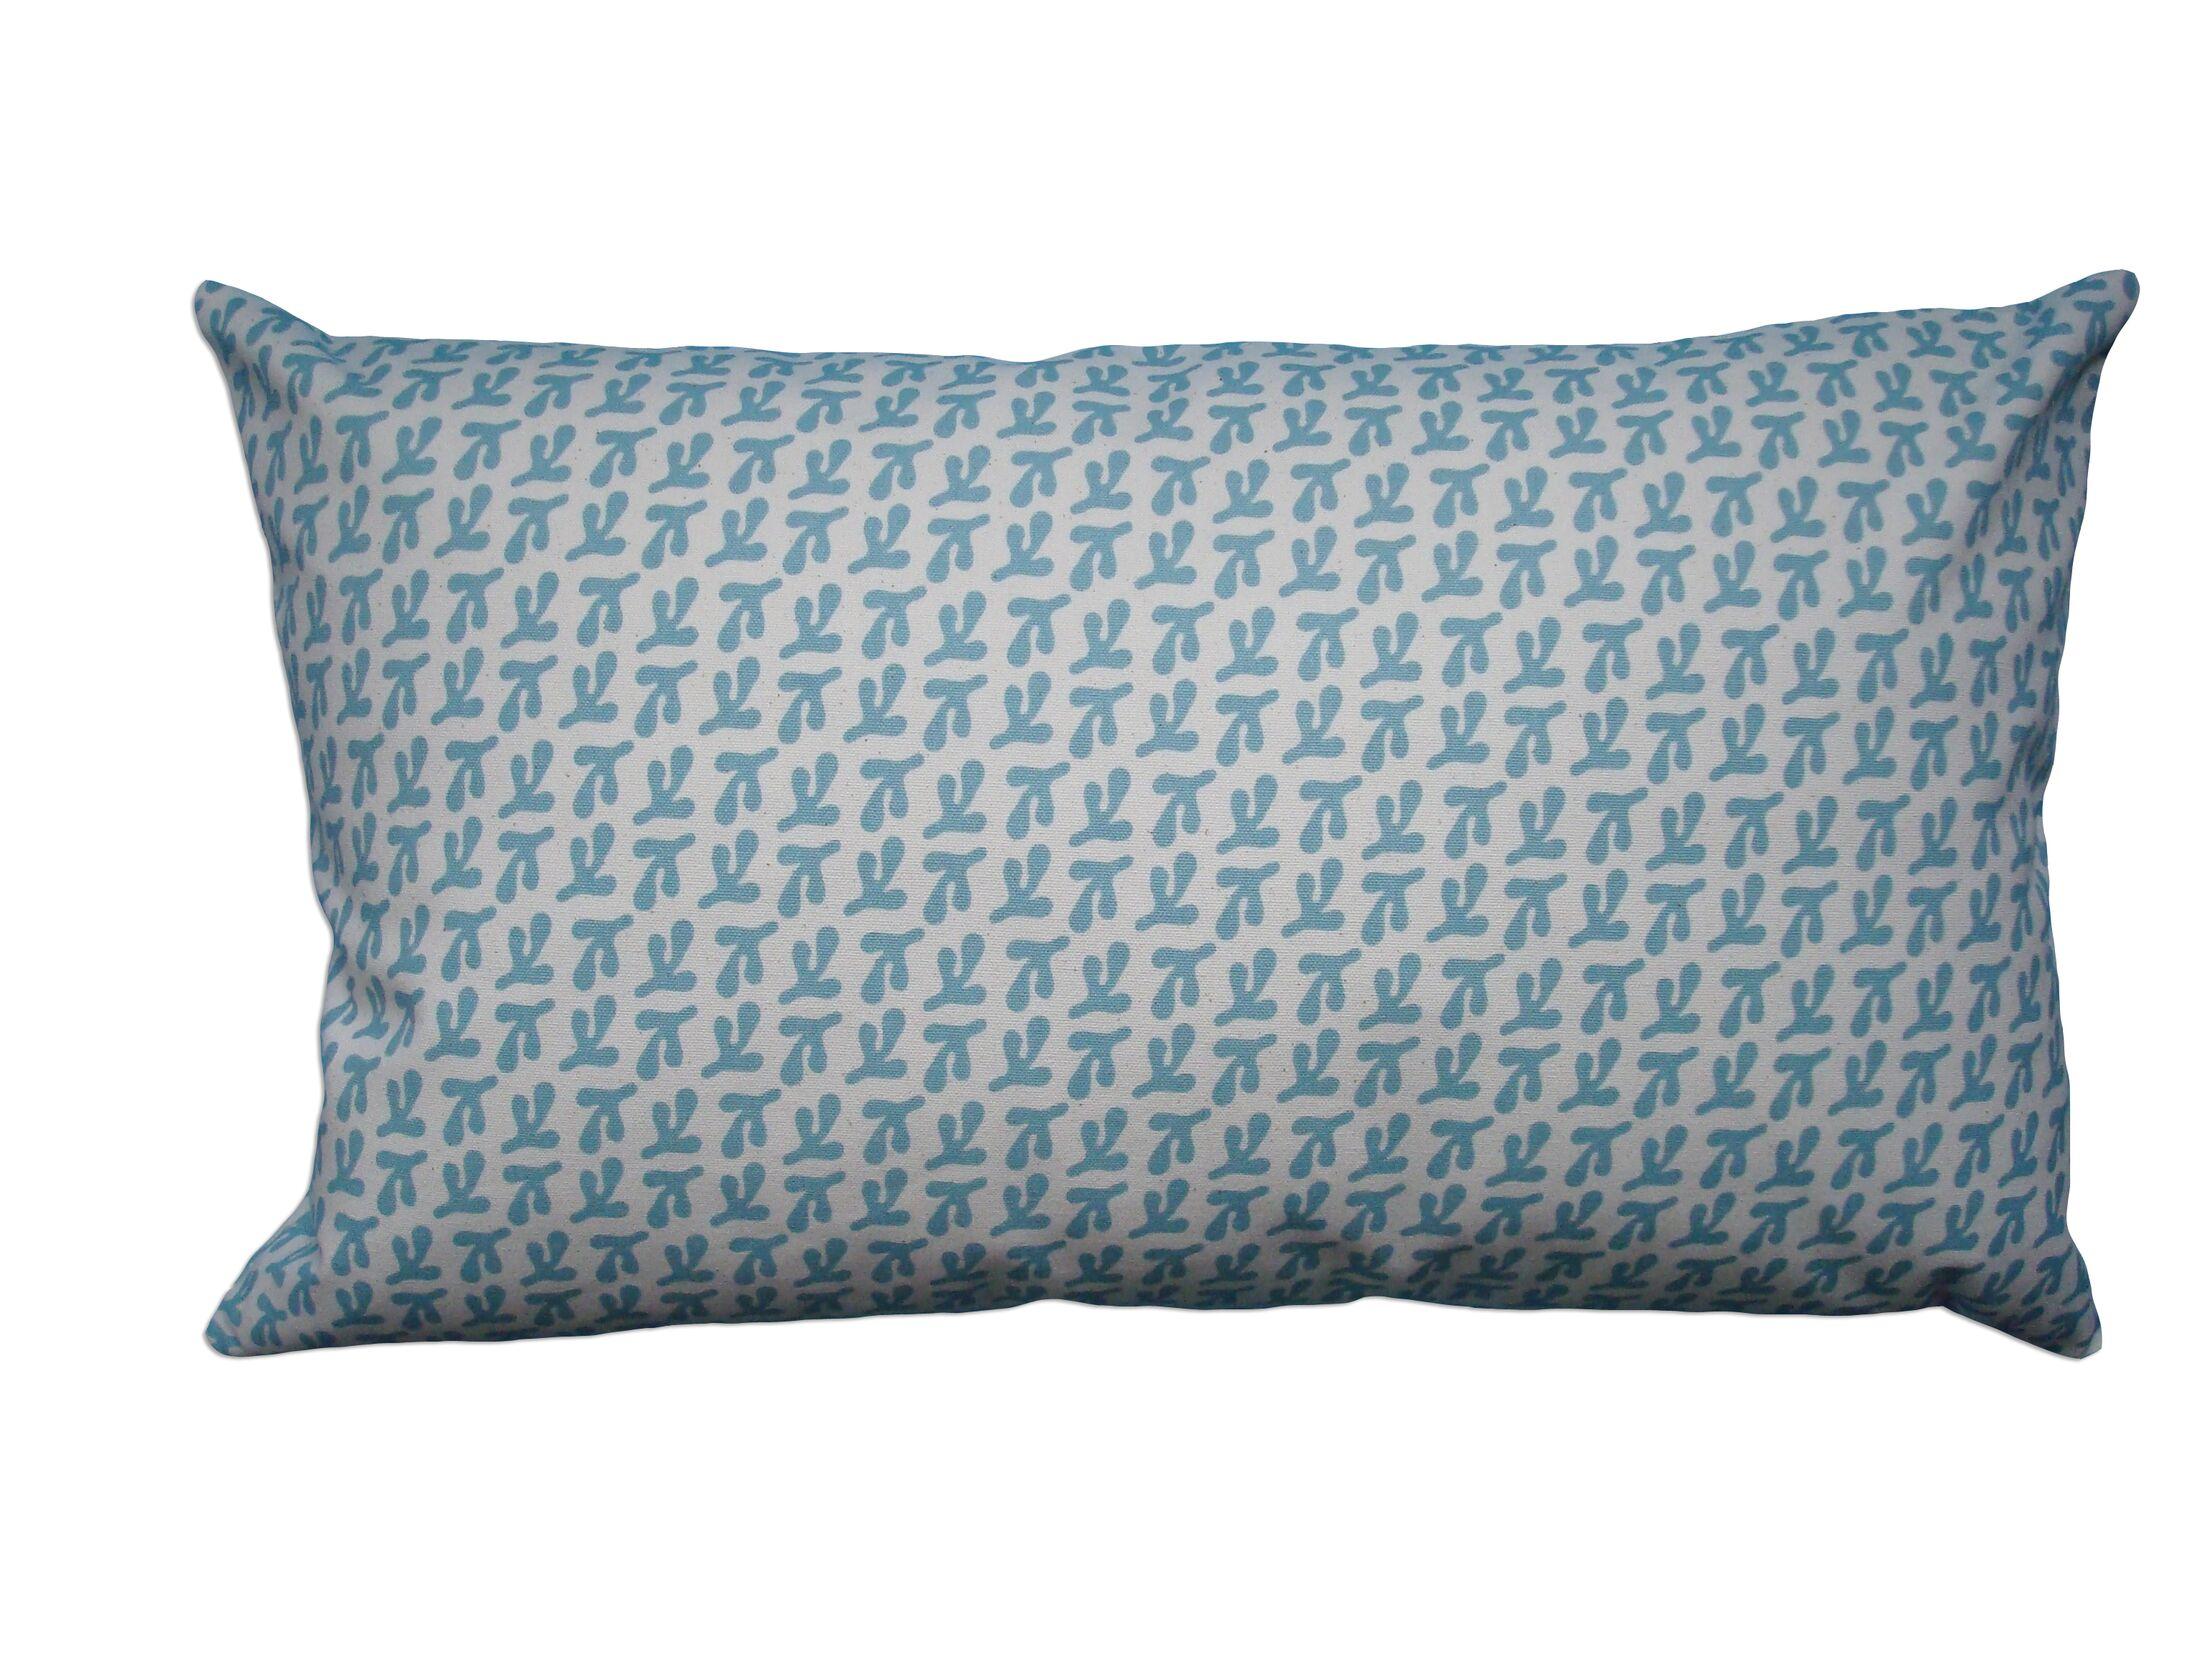 Hand Printed Birds Feet Cotton Throw Pillow Size: 14